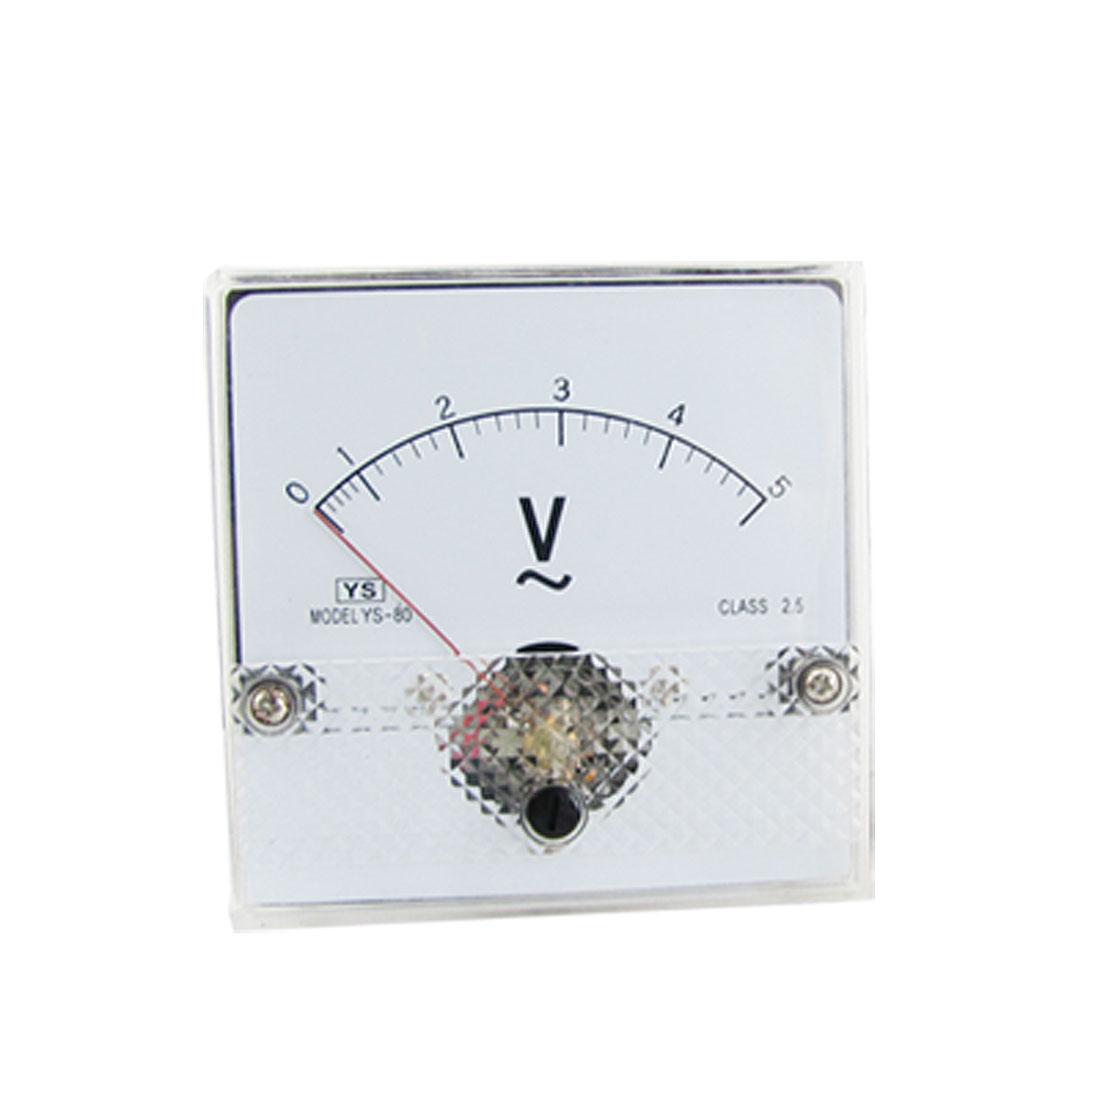 Fine Tuning Dial Analog Panel Meter Voltmeter AC 0-5V